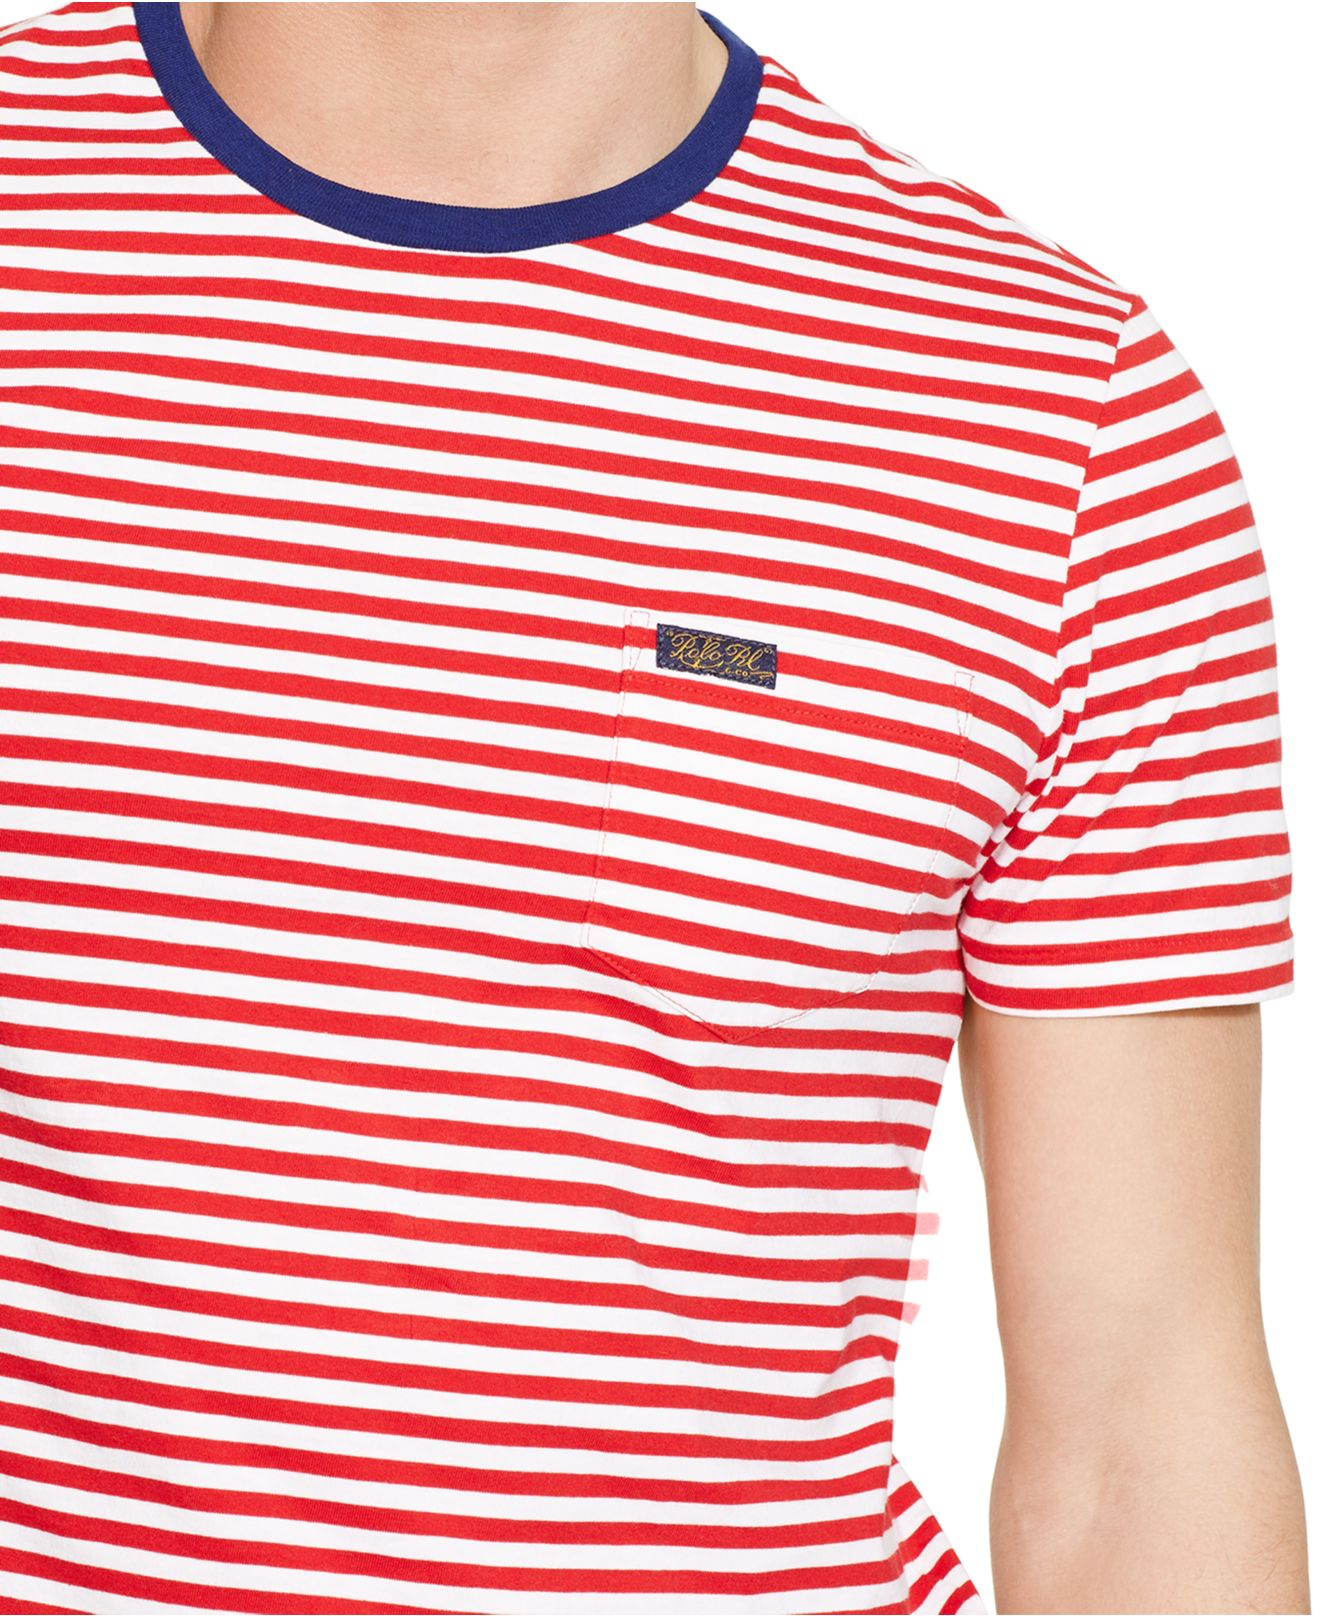 7c341b452f ... sweden lyst polo ralph lauren striped pocket t shirt in red for men  de5dd 47f9b